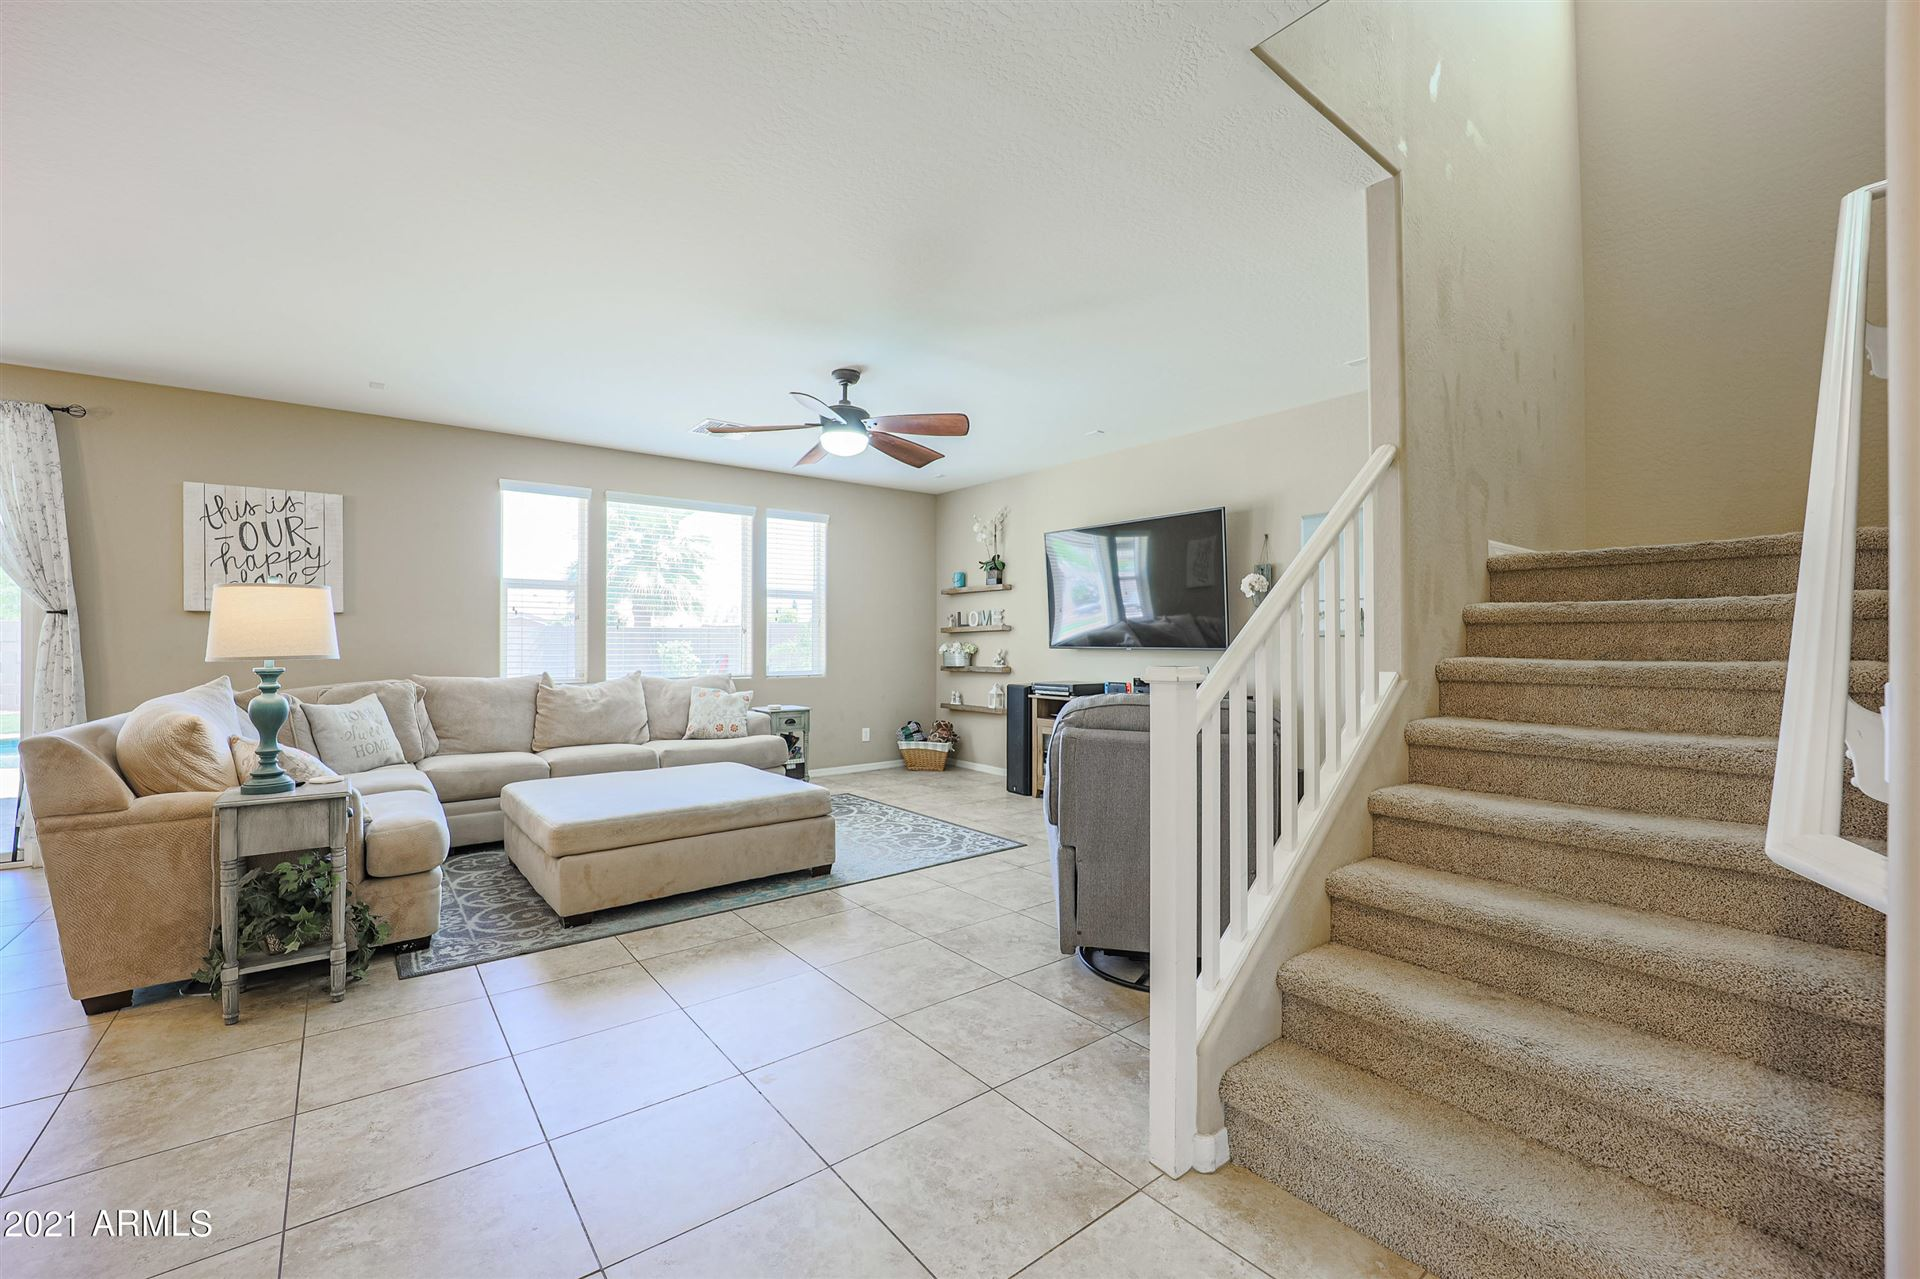 Photo of 3261 N SPRINGFIELD Street, Buckeye, AZ 85396 (MLS # 6231924)